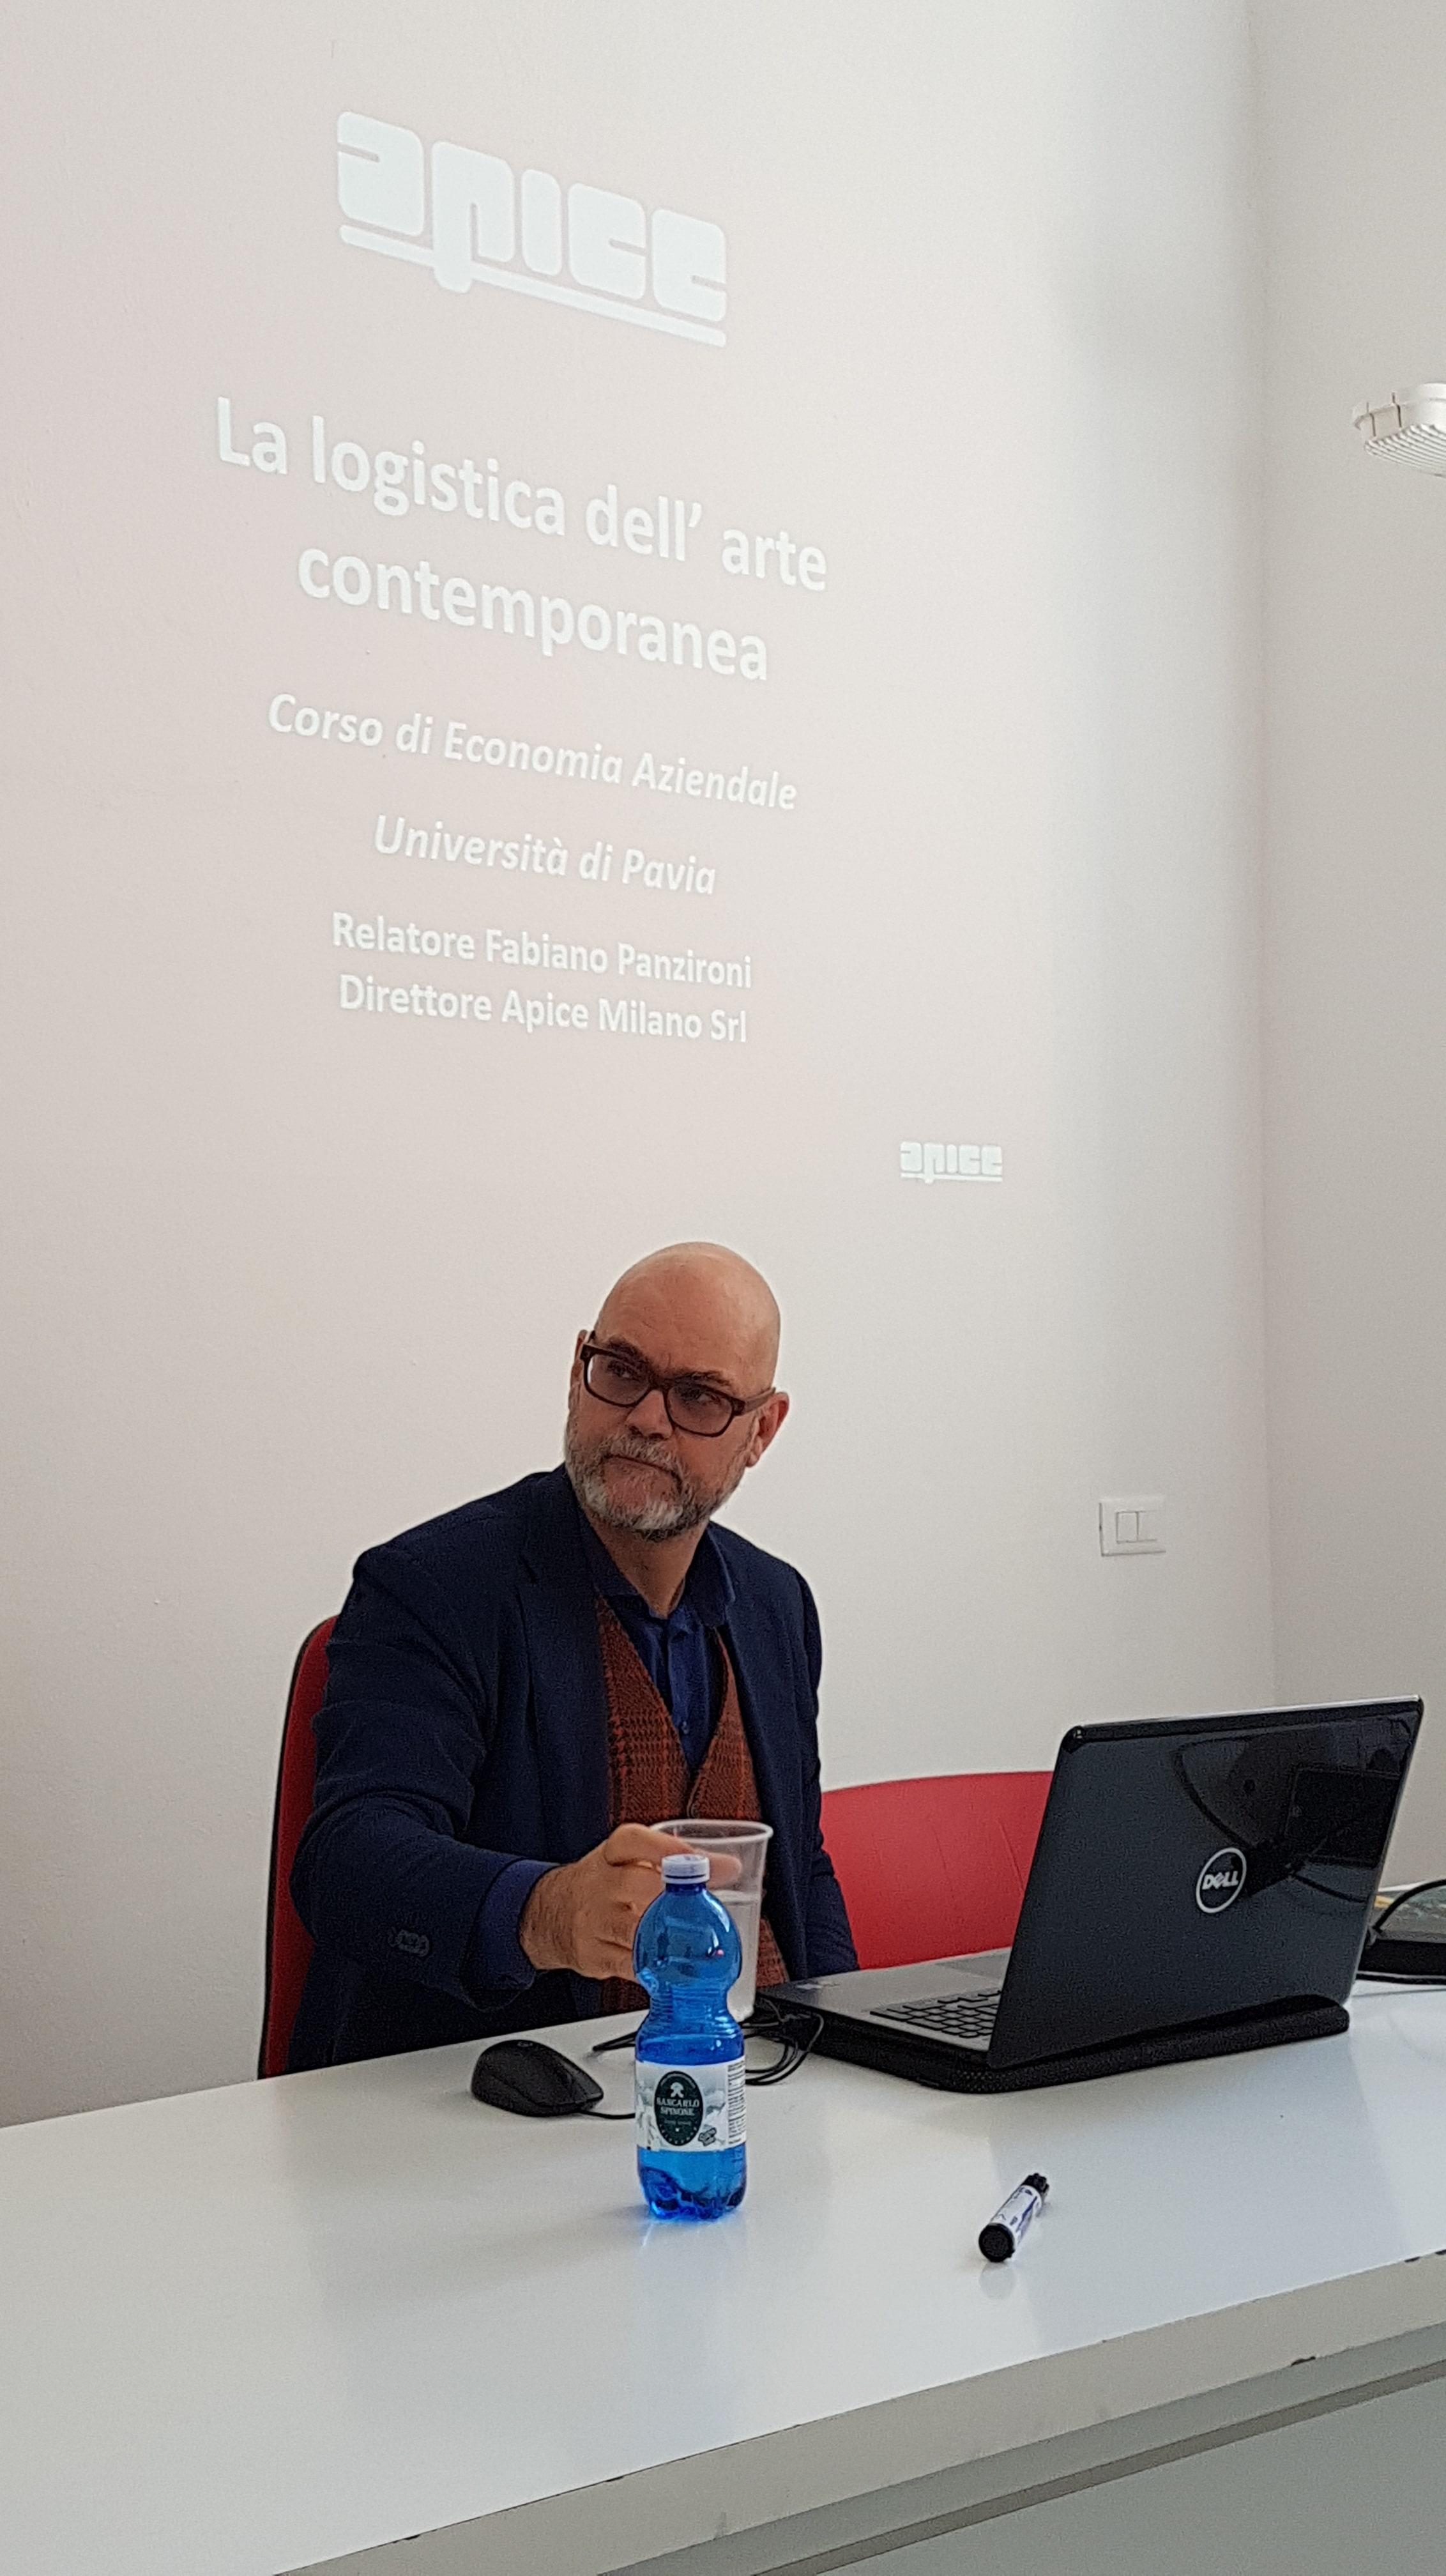 seminario Fabiano Panzironi a.a. 2018/19